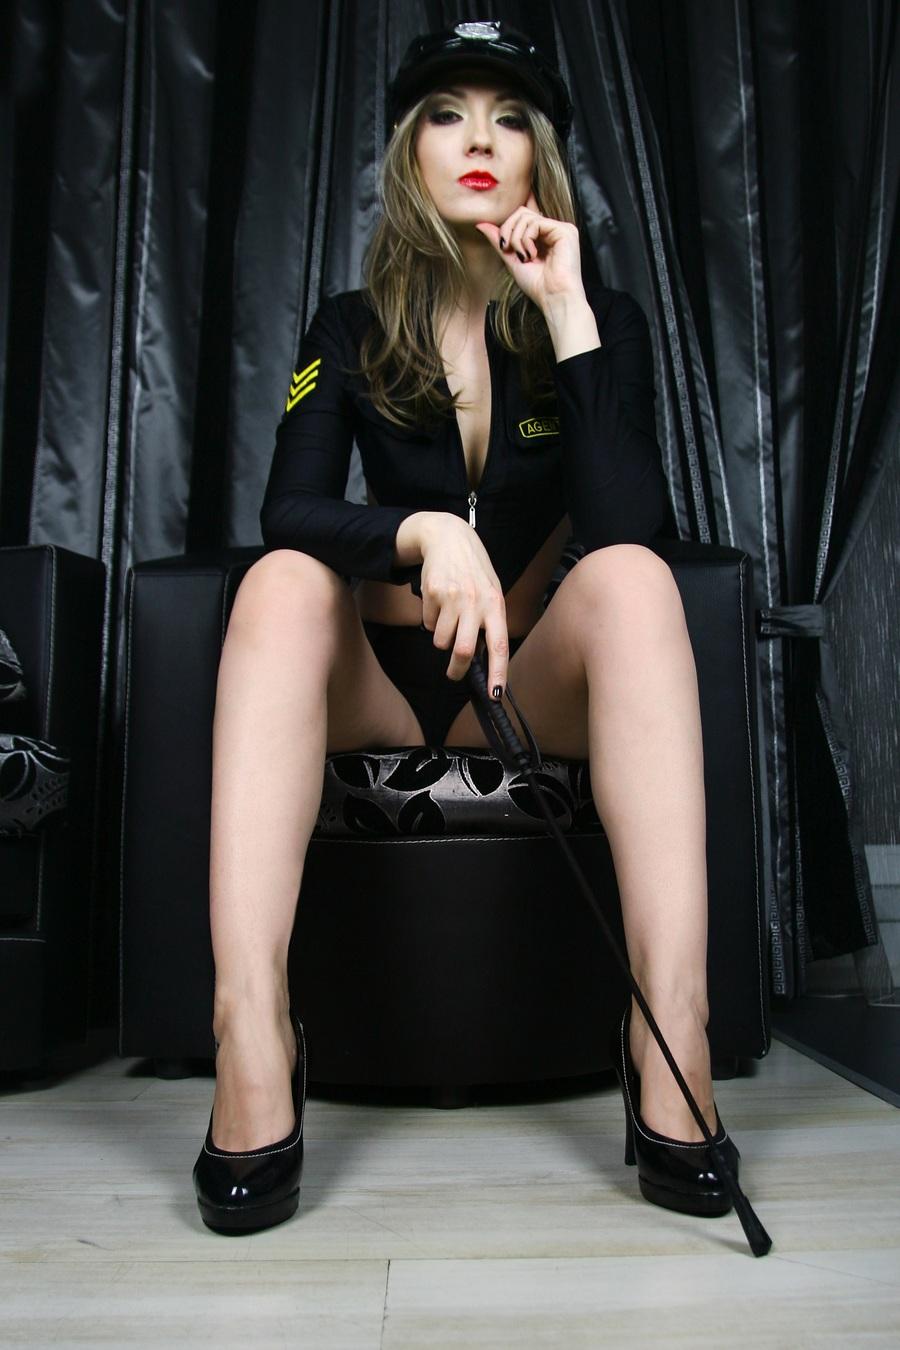 Mistress / Photography by Anna Edelrid, Model JoanaRuby / Uploaded 28th September 2017 @ 05:33 PM